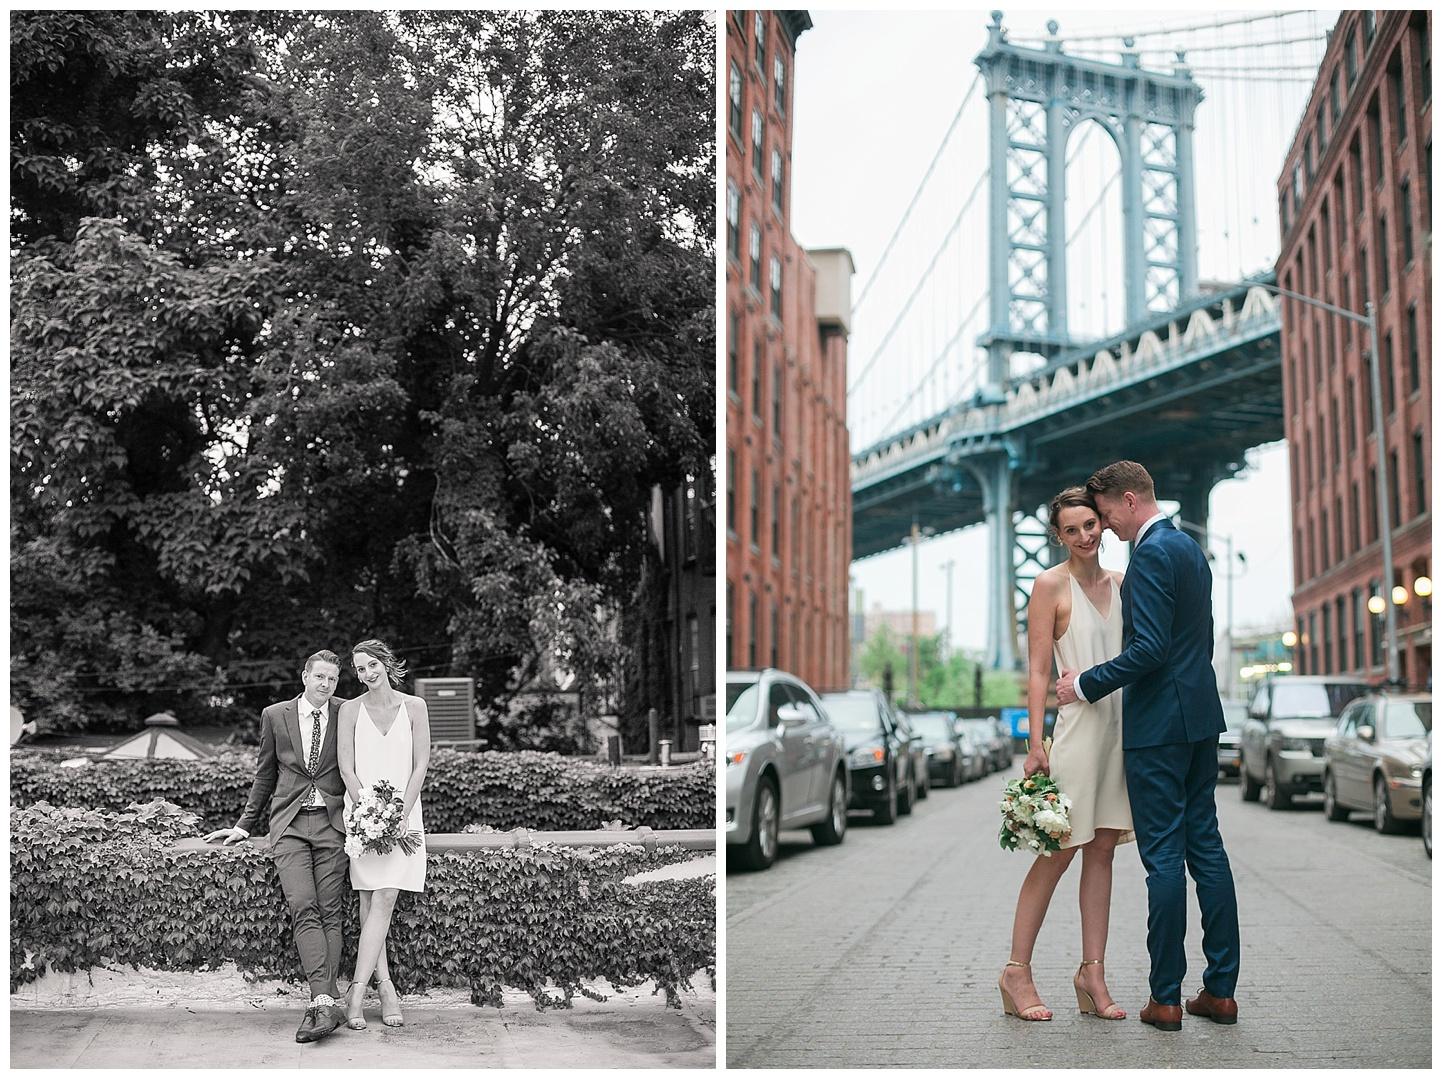 Photography: Stylish and Hip Weddings / http://www.elopingisfun.com/